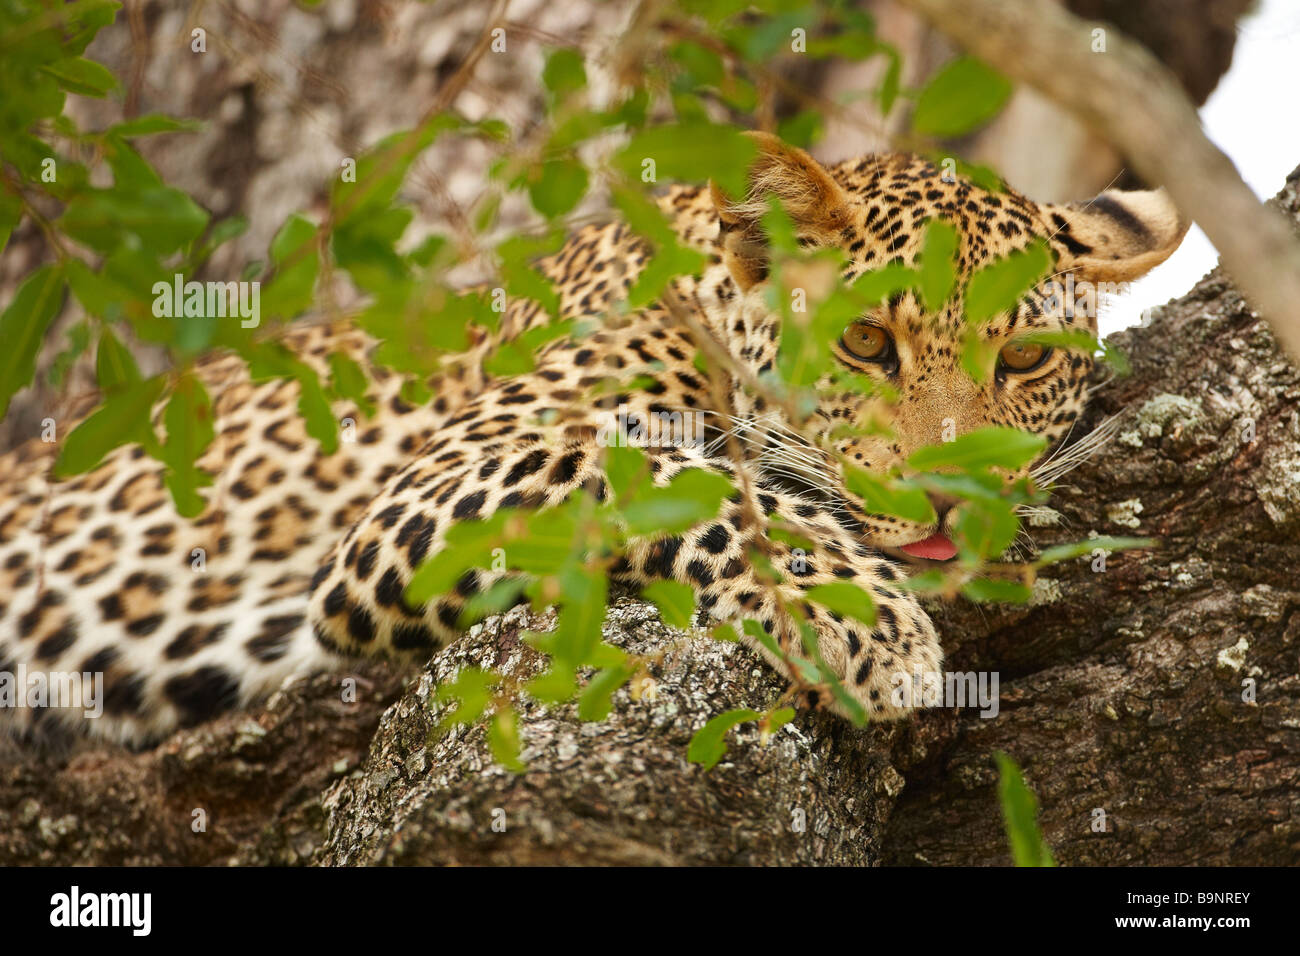 Leoparden ruht in einem Baum, Krüger Nationalpark, Südafrika Stockbild